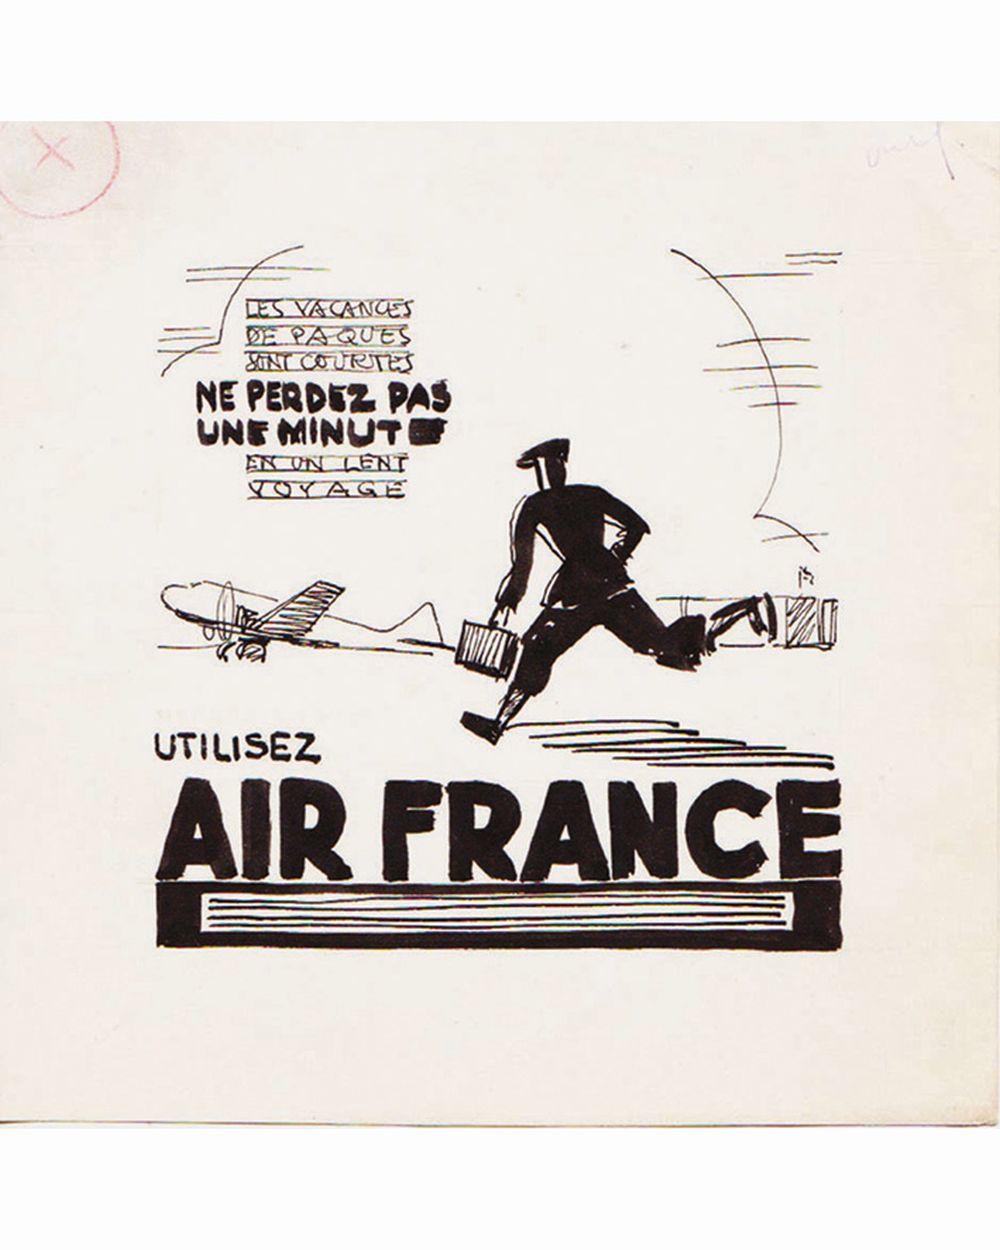 DOOB - Les Vacances de Pâques ..Air France dessin à l'encre de chine drawing in china ink unic piece     1938